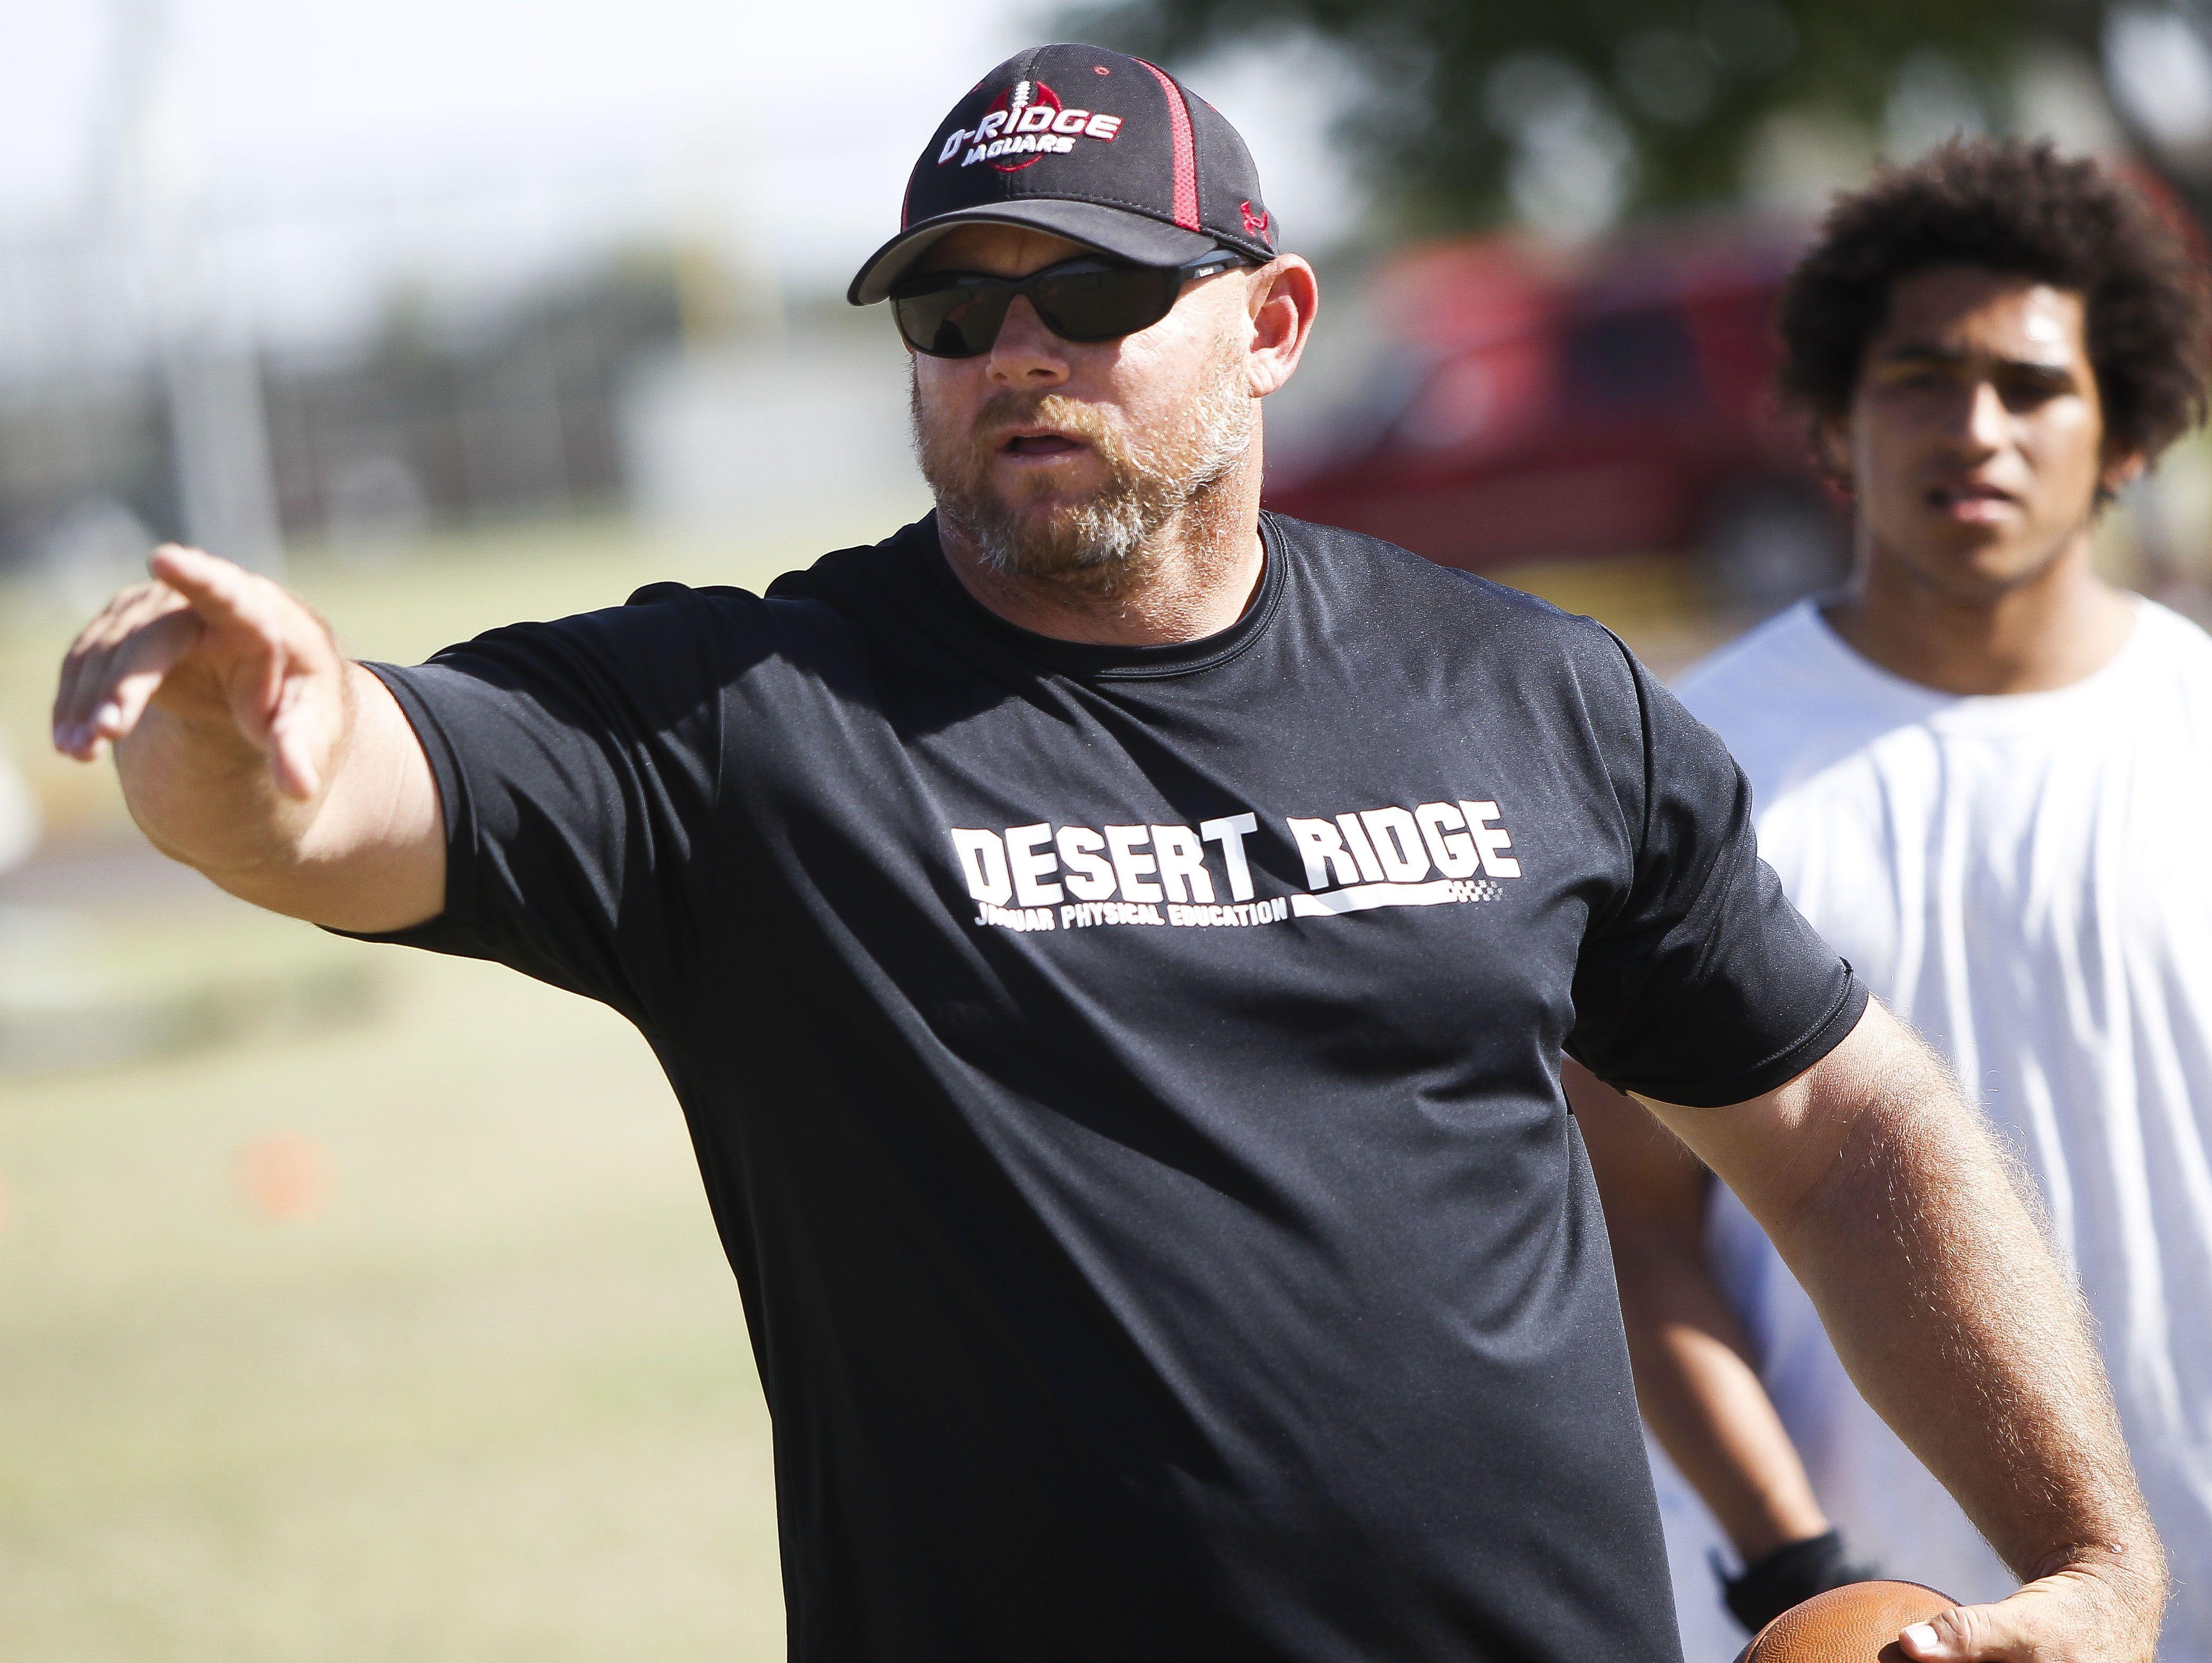 Head coach Jeremy Hathcock leads practice as the Desert Ridge Football team practices on Wednesday, April 27, 2016, at Desert Ridge High School in Mesa, Ariz.